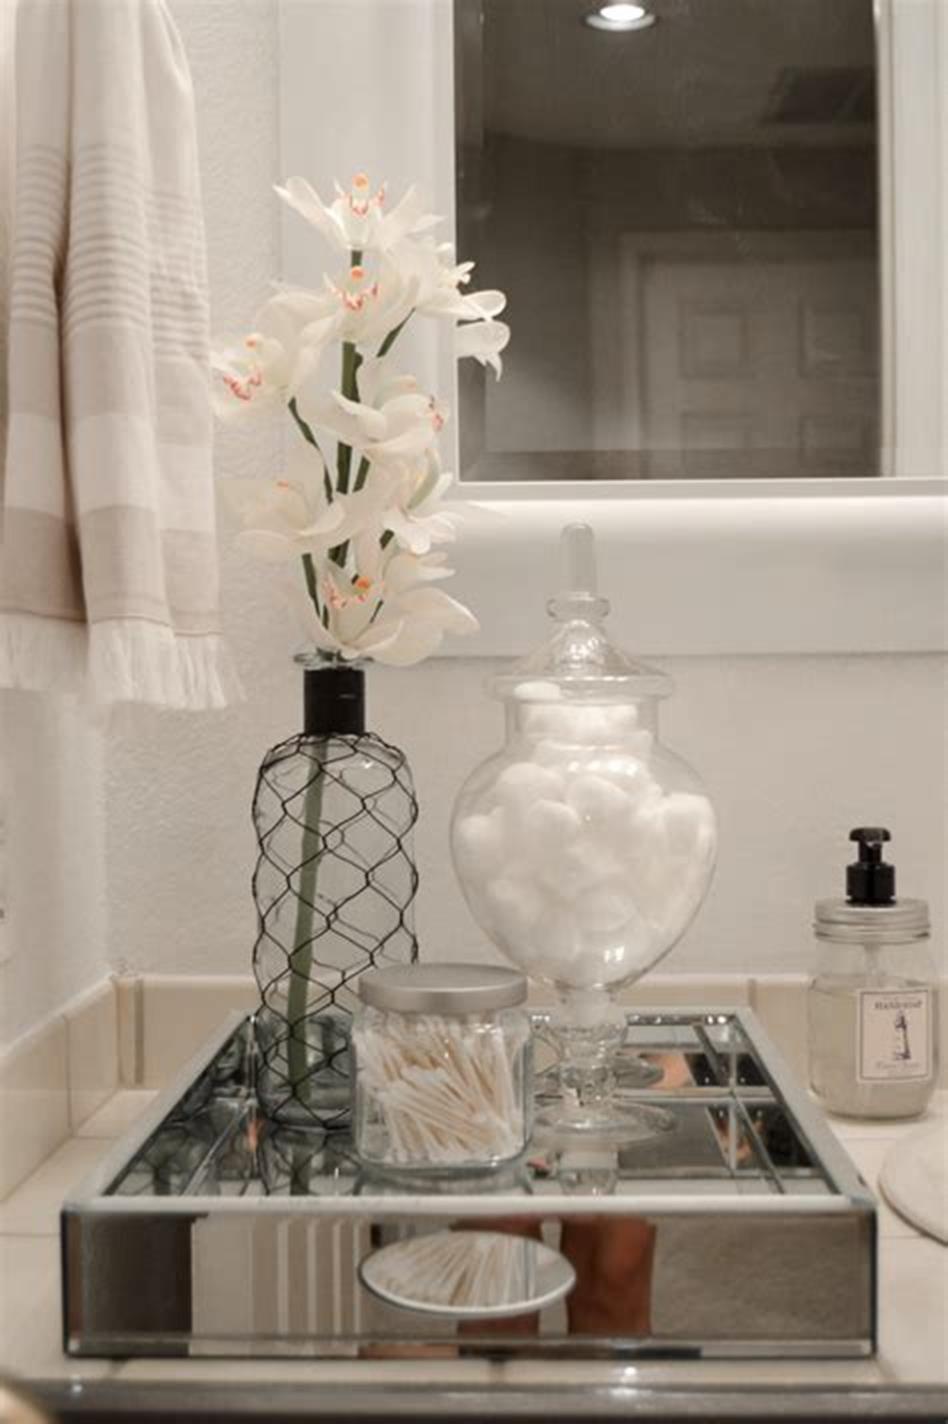 40 Beautiful Bathroom Vanity Tray Decor Ideas Decorecent Beautiful Bathroom Vanity Bathroom Vanity Tray Vanity Tray Decor